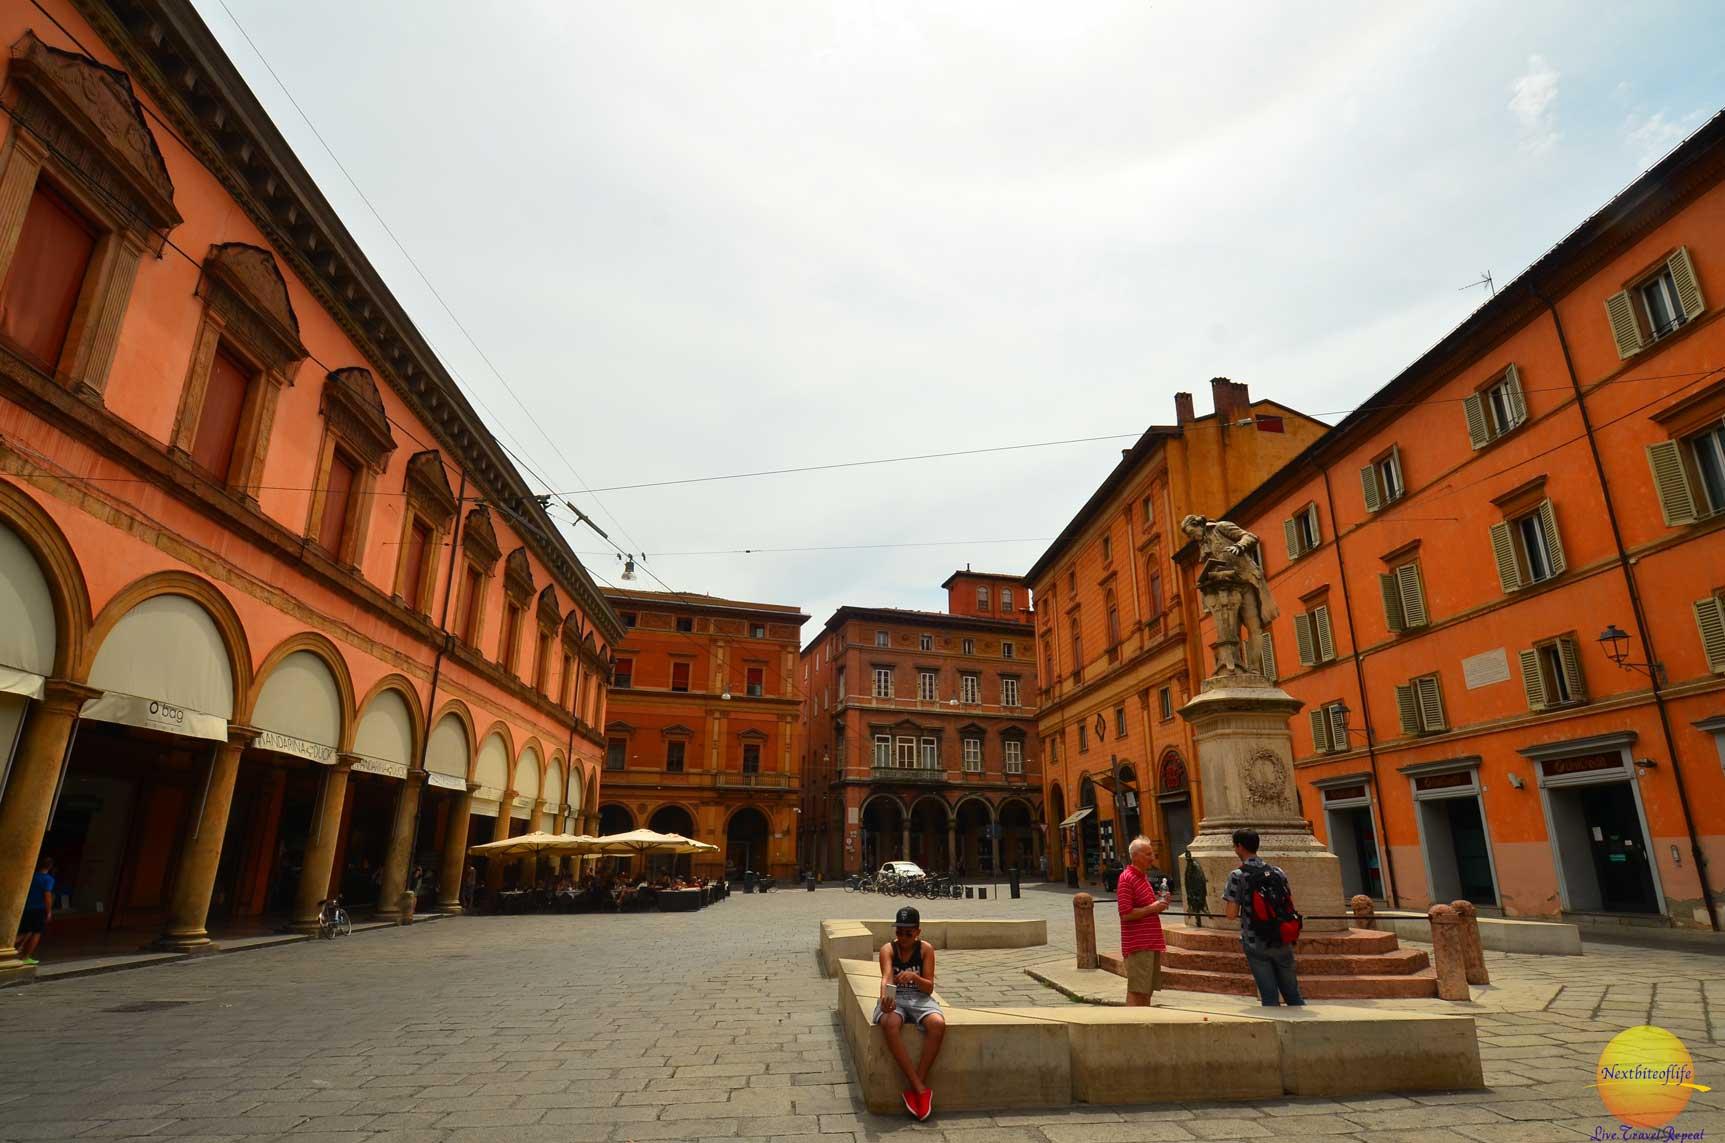 bolgona italy red buildings